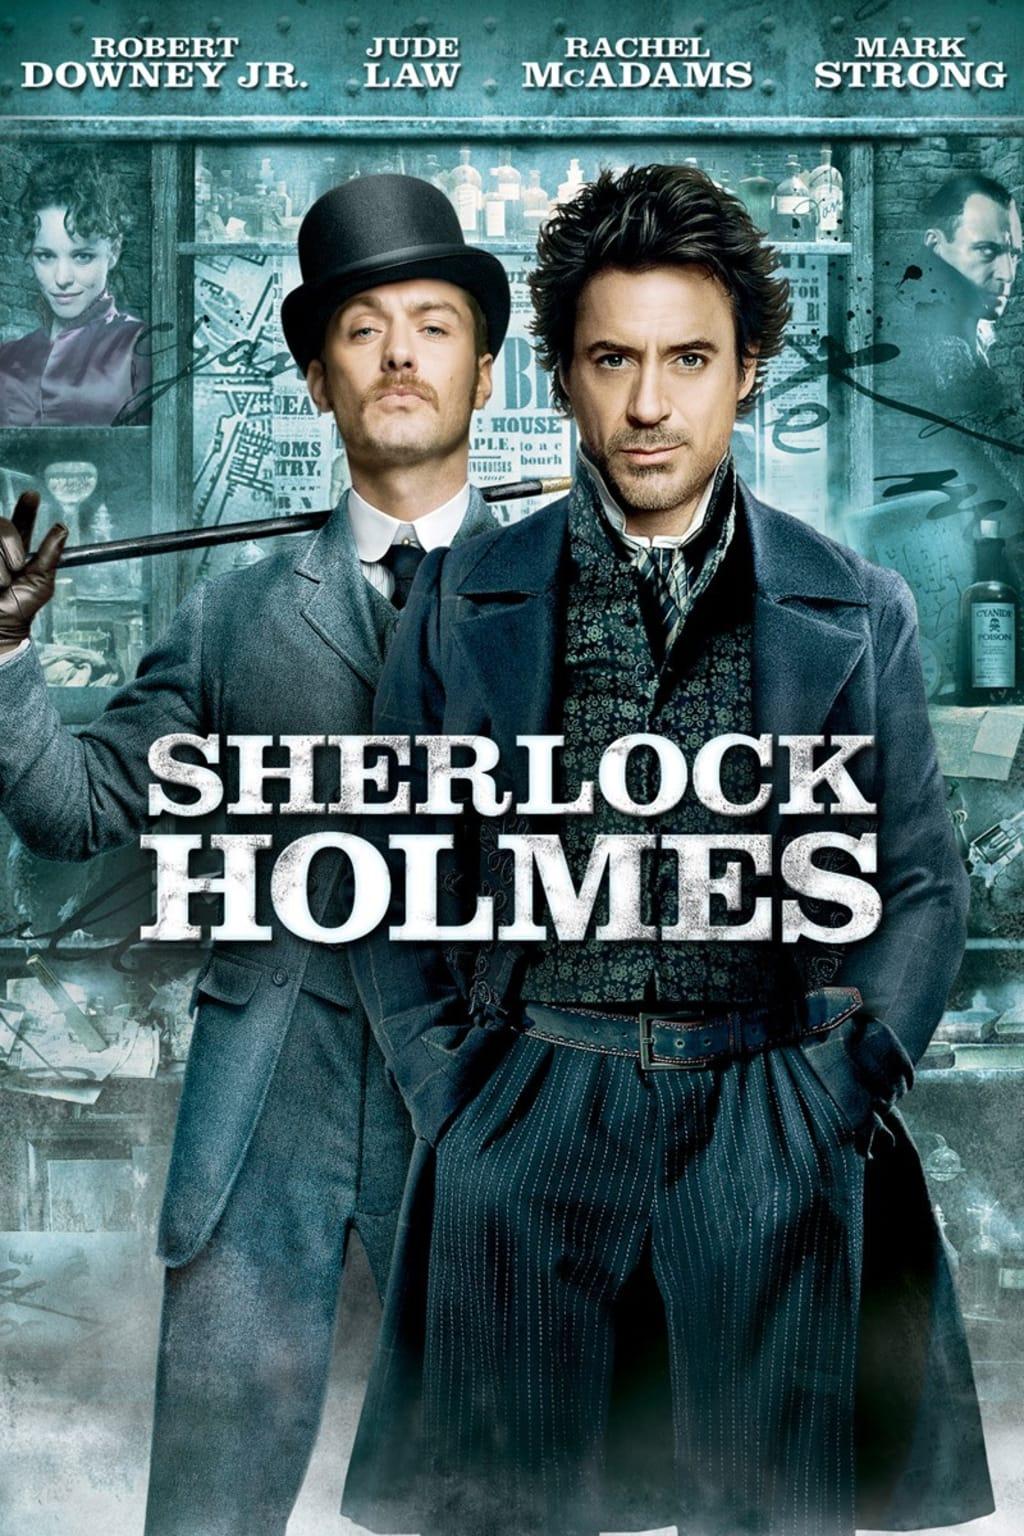 A Filmmaker's Guide: Guy Ritchie's 'Sherlock Holmes' (2009)